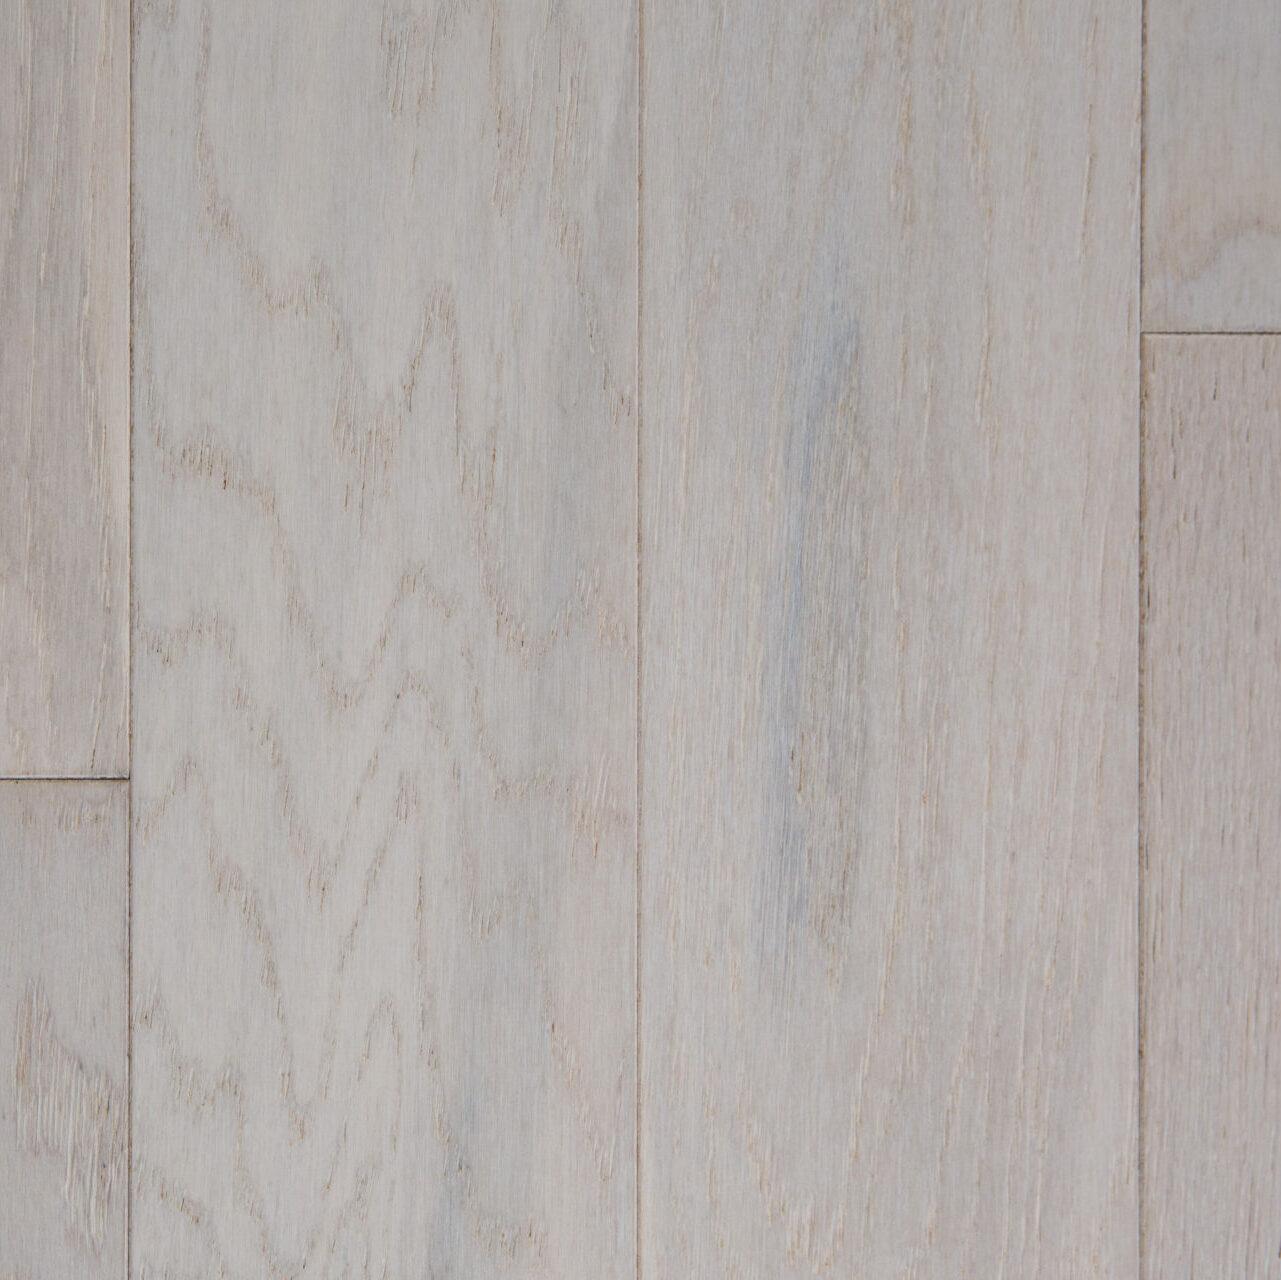 Wood Parquet Flooring - Double-White